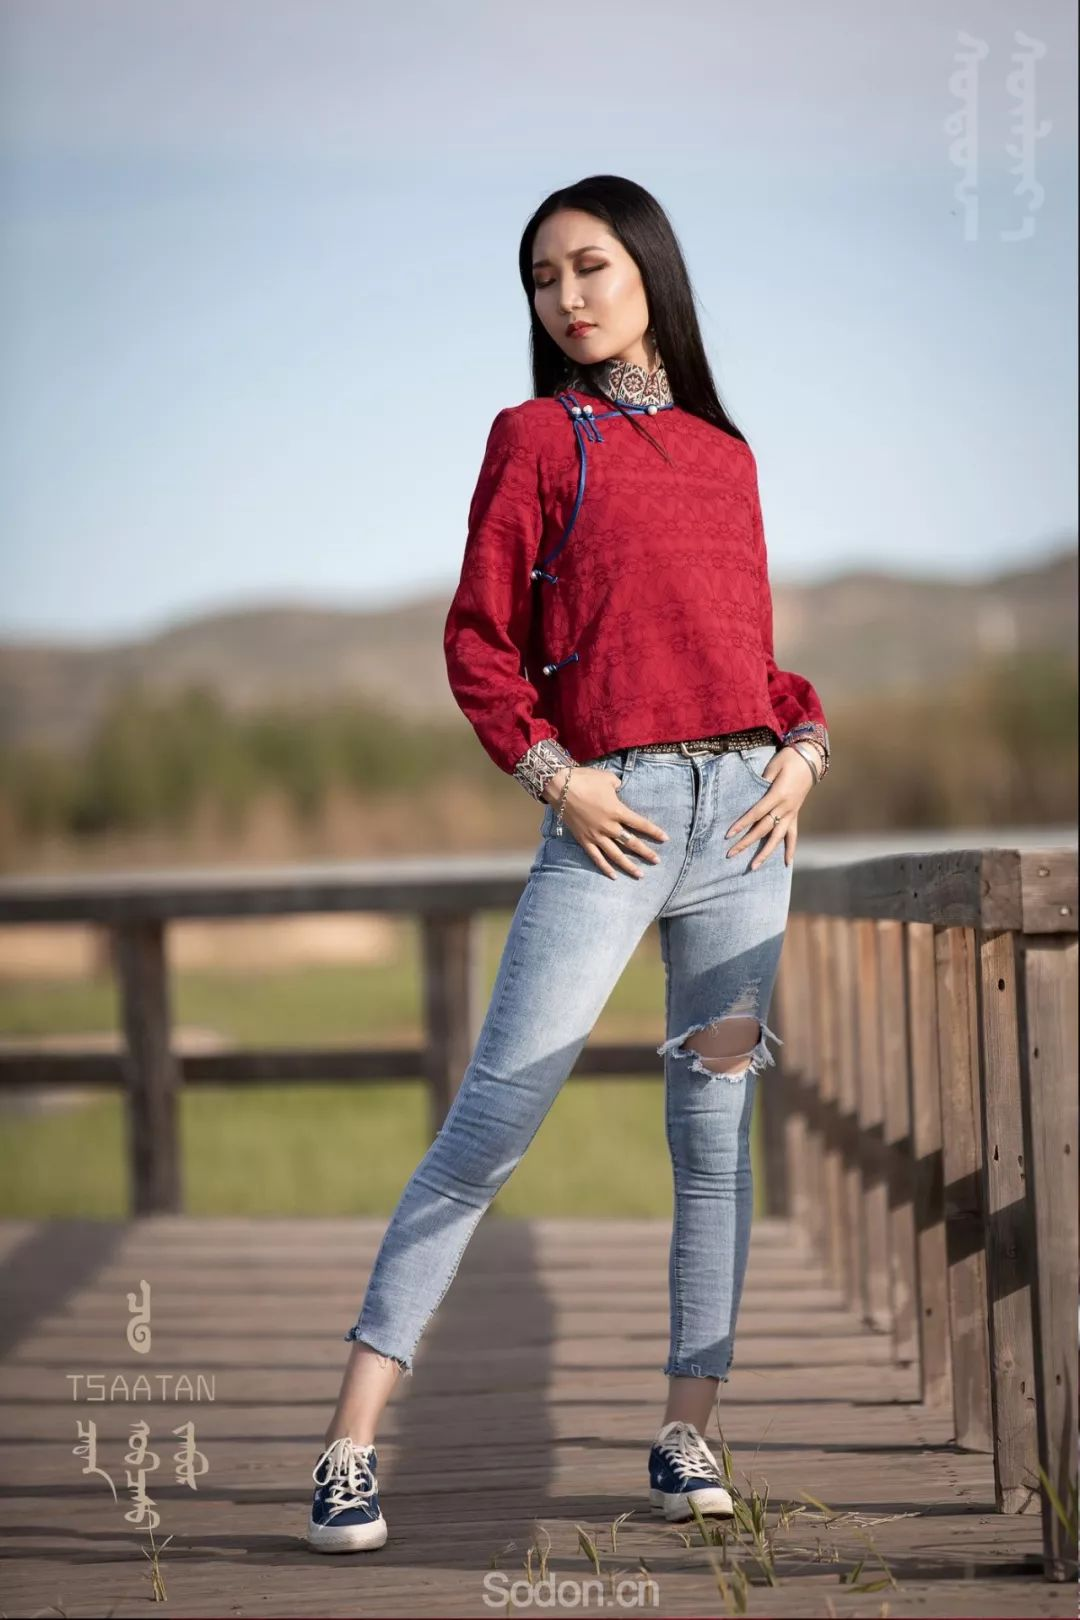 TSAATAN蒙古时装 2019夏季新款首发 第100张